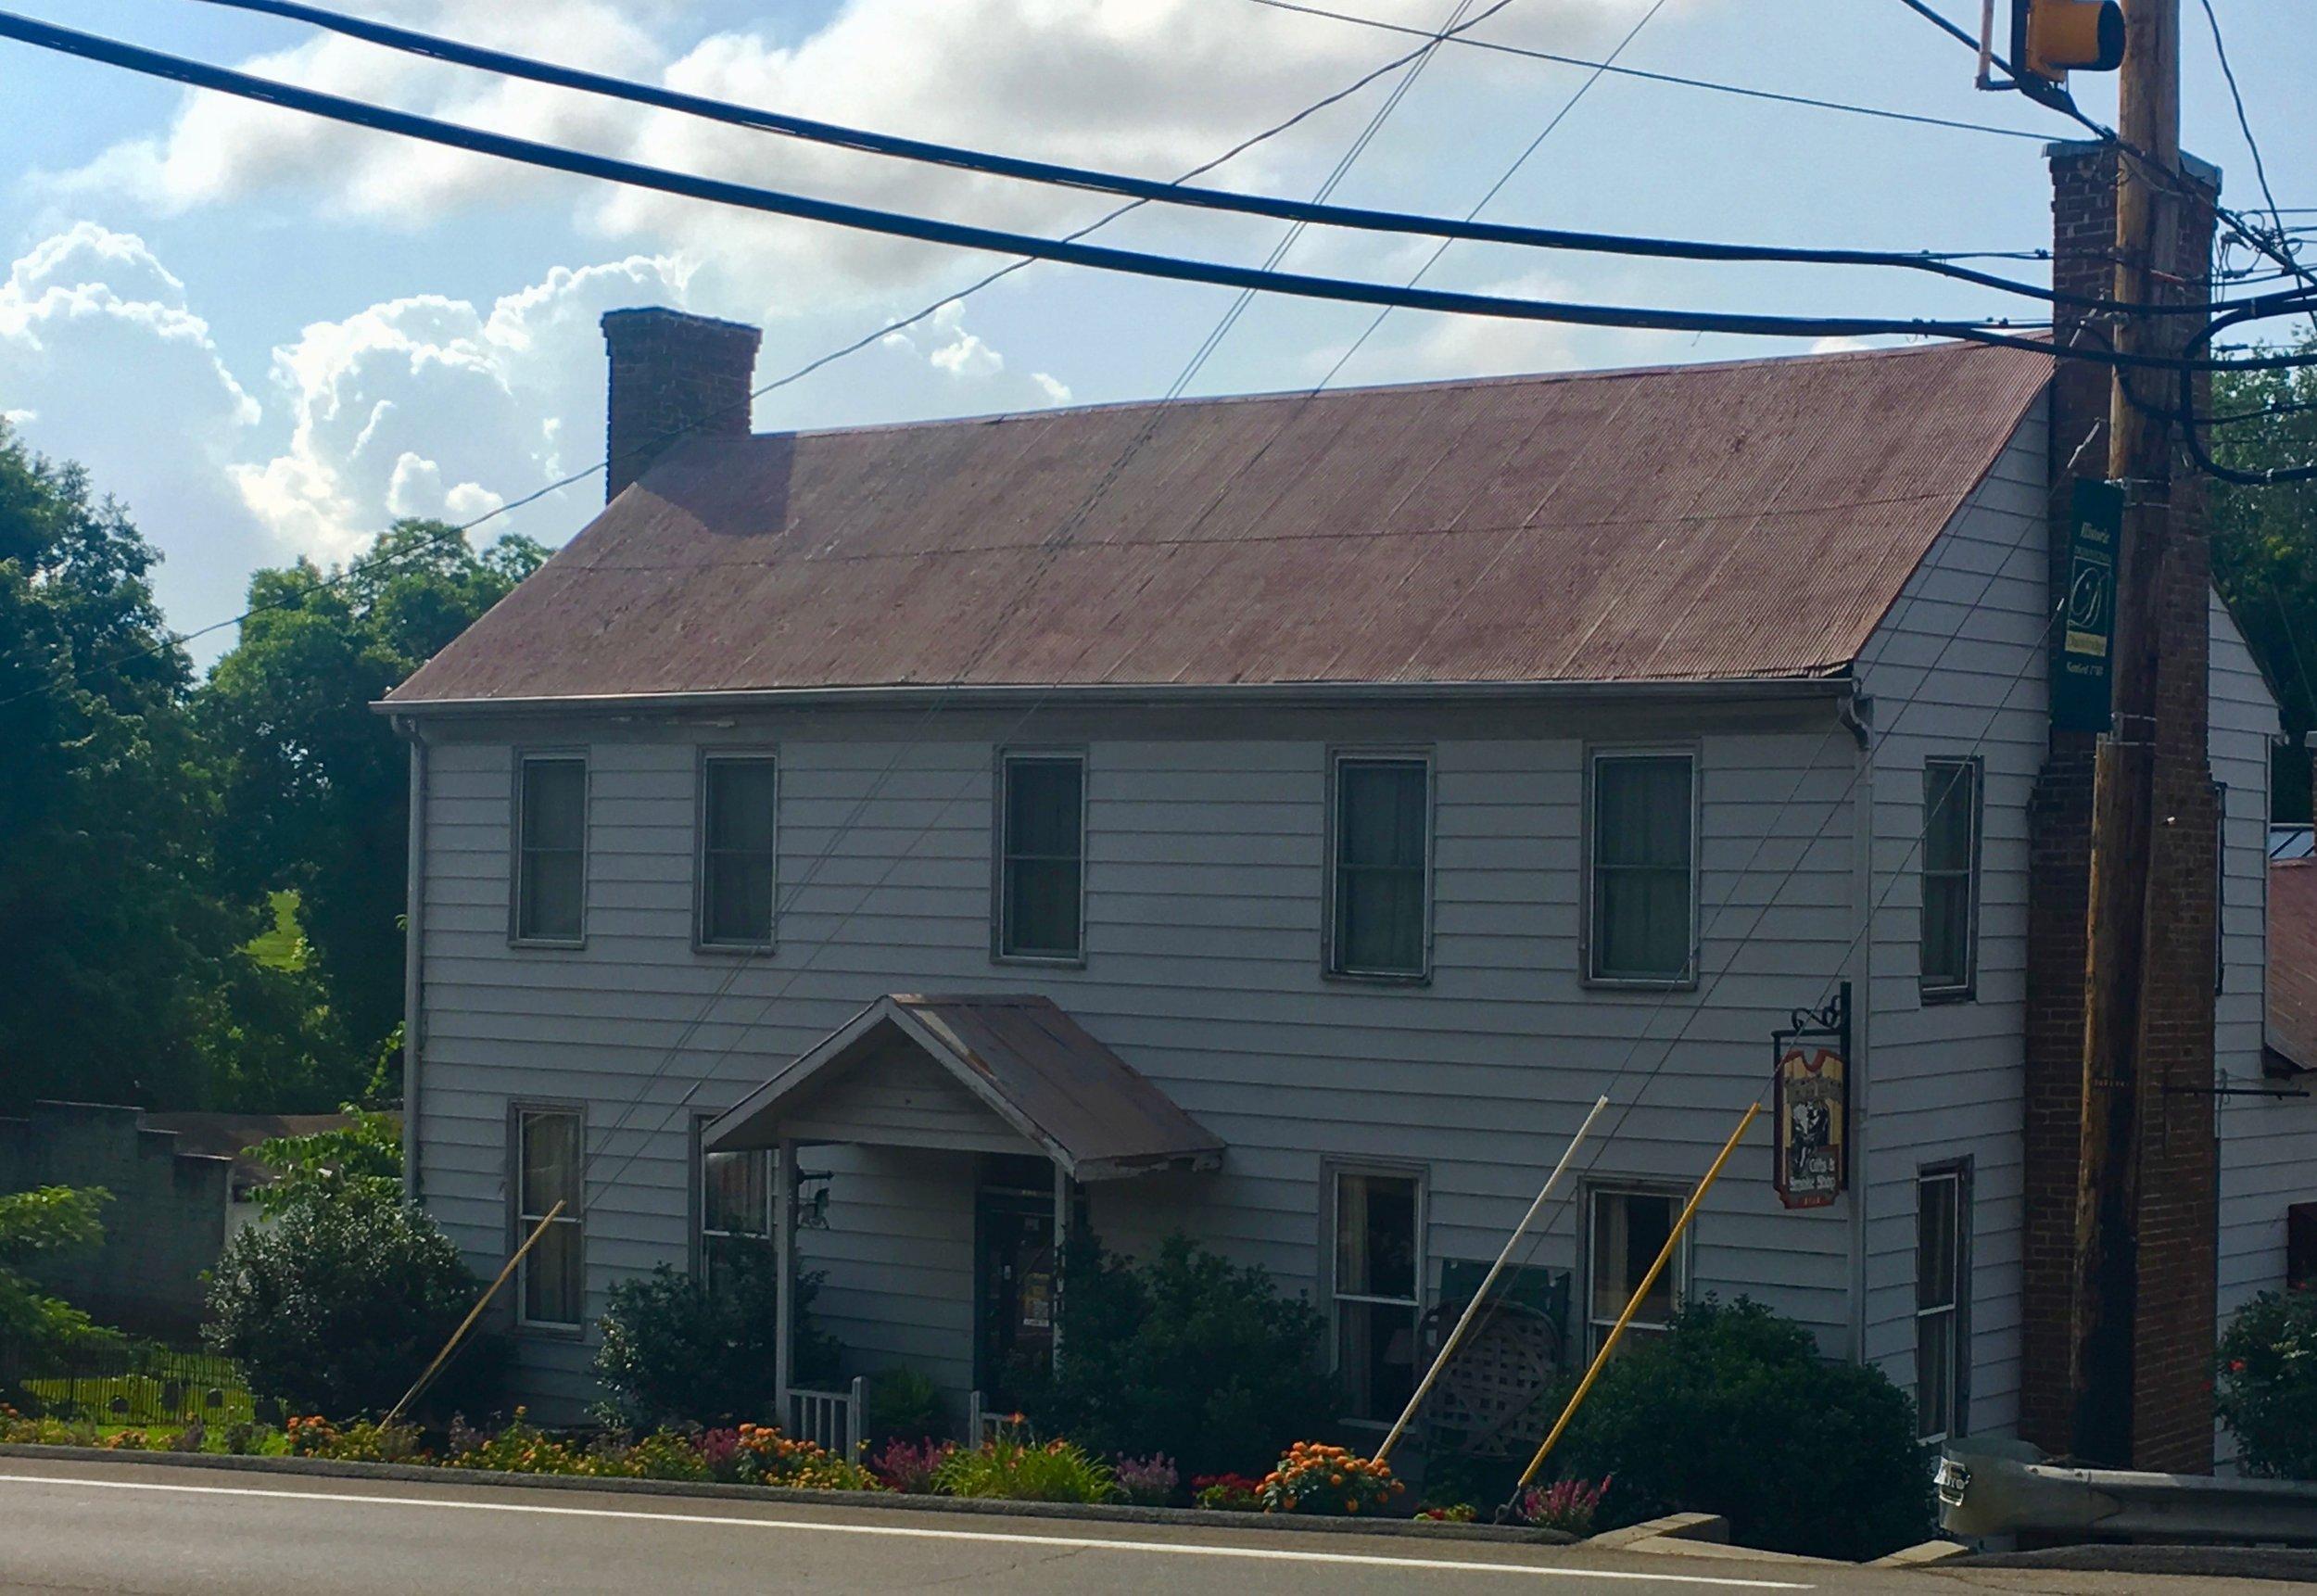 101 E. Meeting Street – Thomas Tavern circa 1843